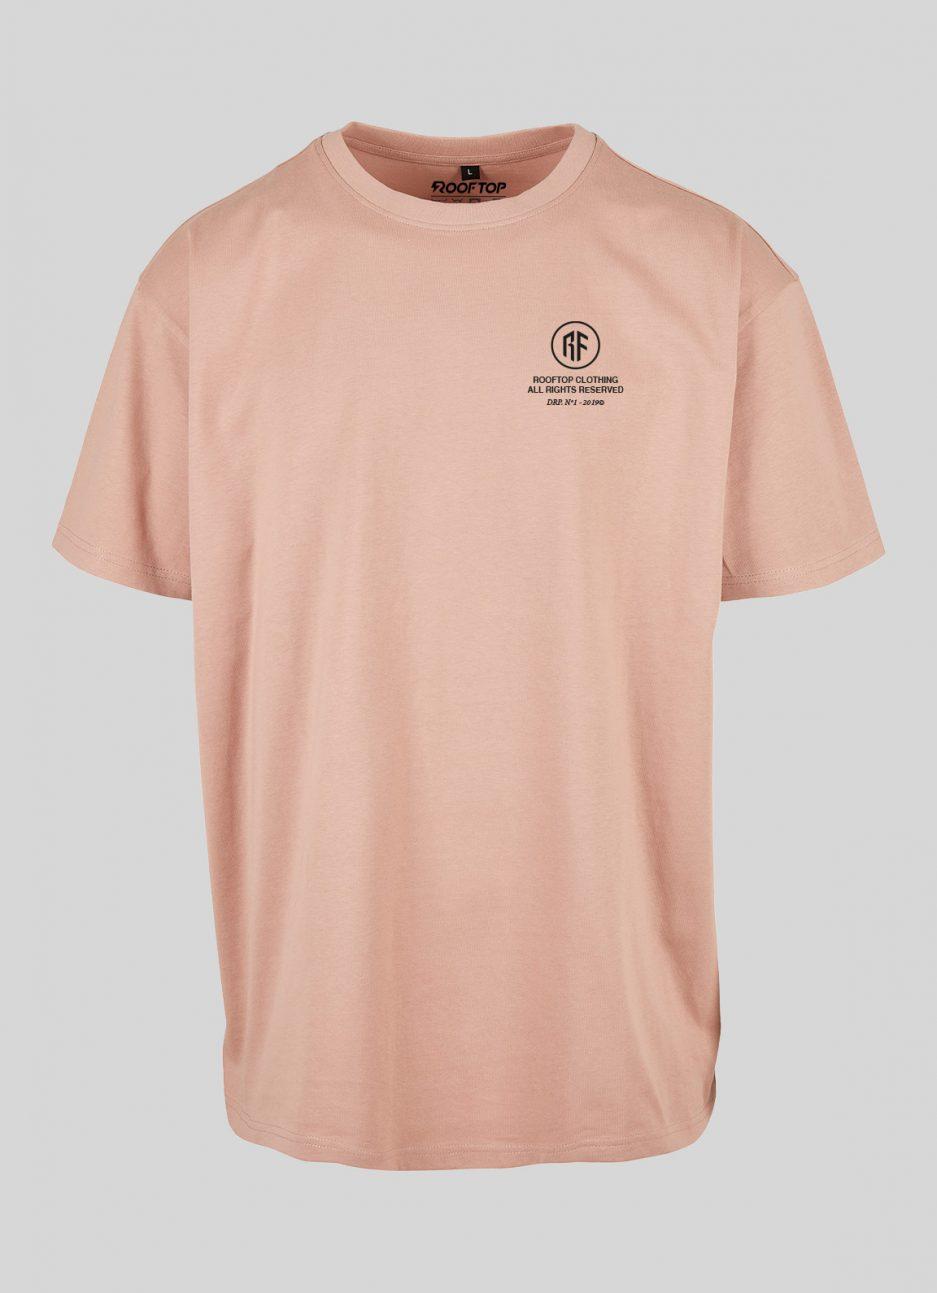 Oversize Amber T-Shirt Wordlwide